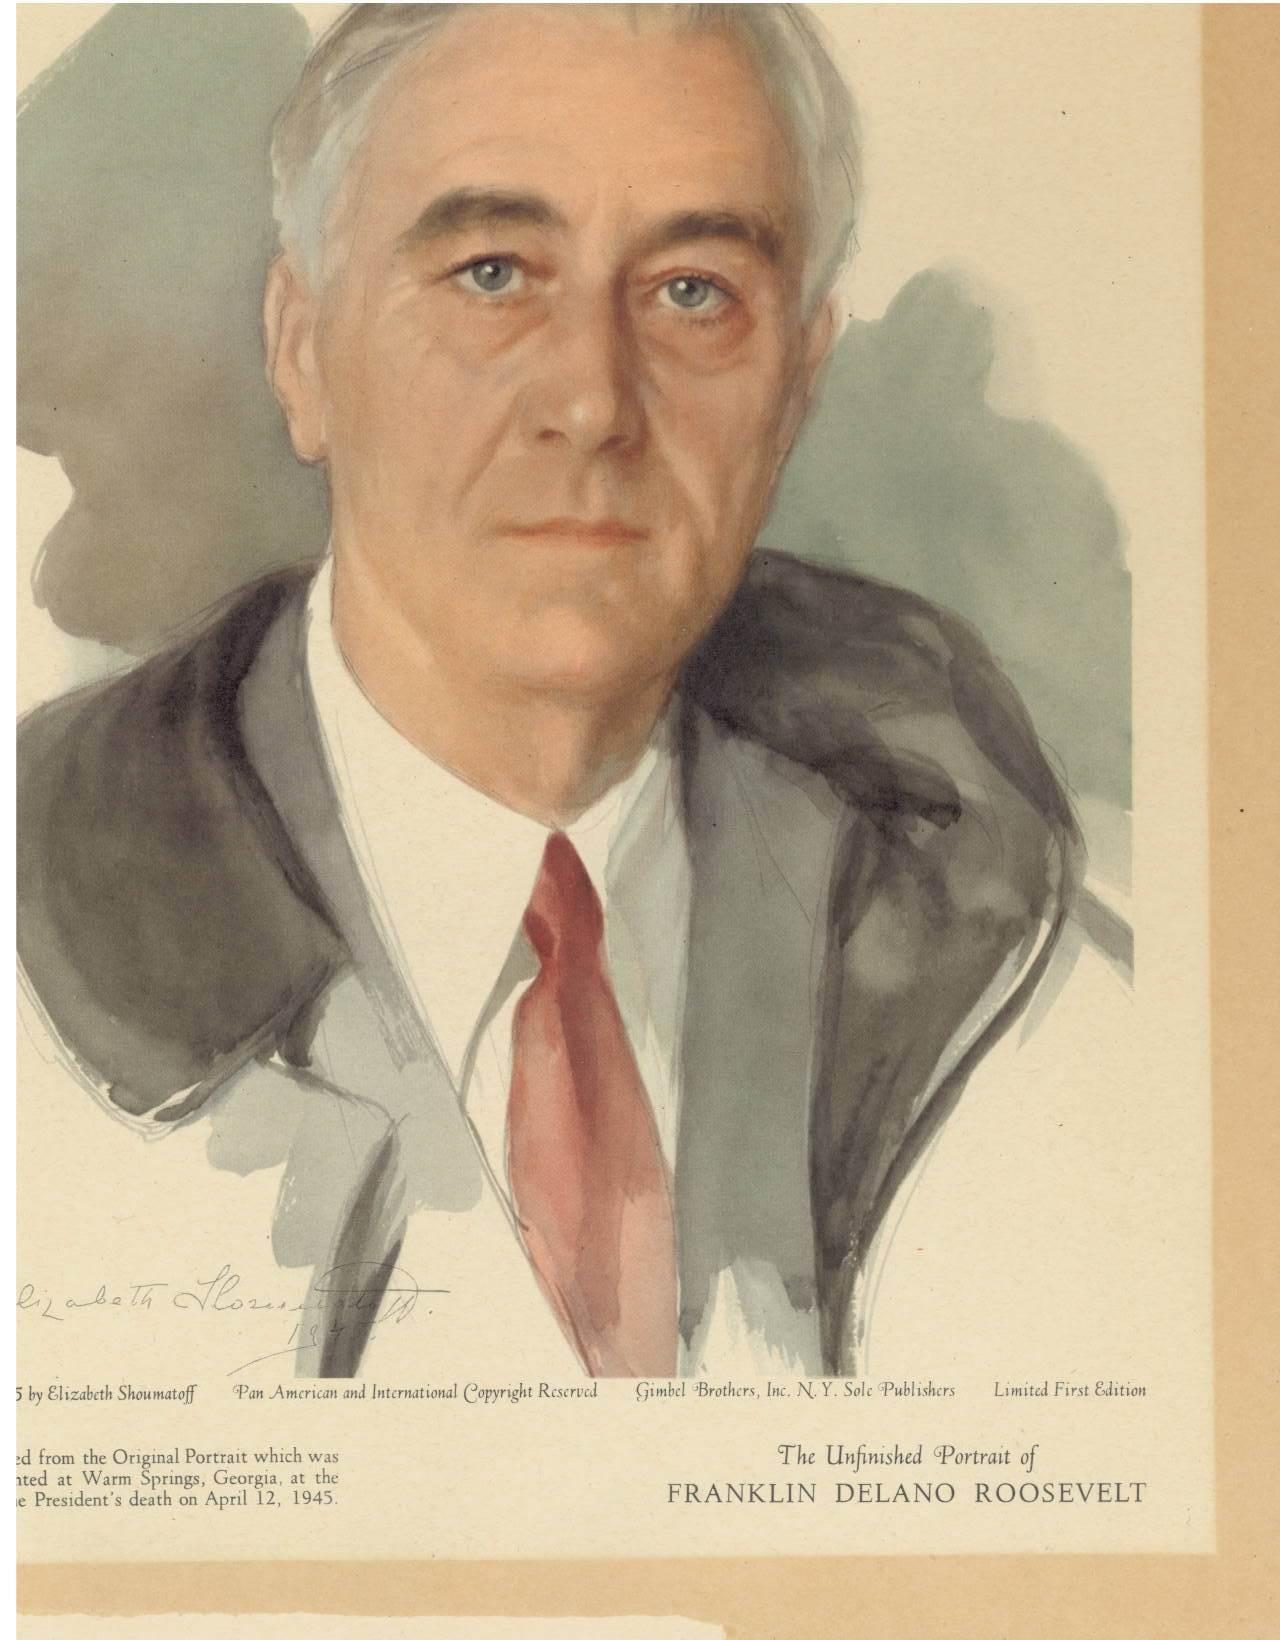 Unfinished Portrait Of Franklin D Roosevelt : unfinished, portrait, franklin, roosevelt, Years, After, Death,, Remember, Roosevelt, House, Public, Policy, Institute, Hunter, College